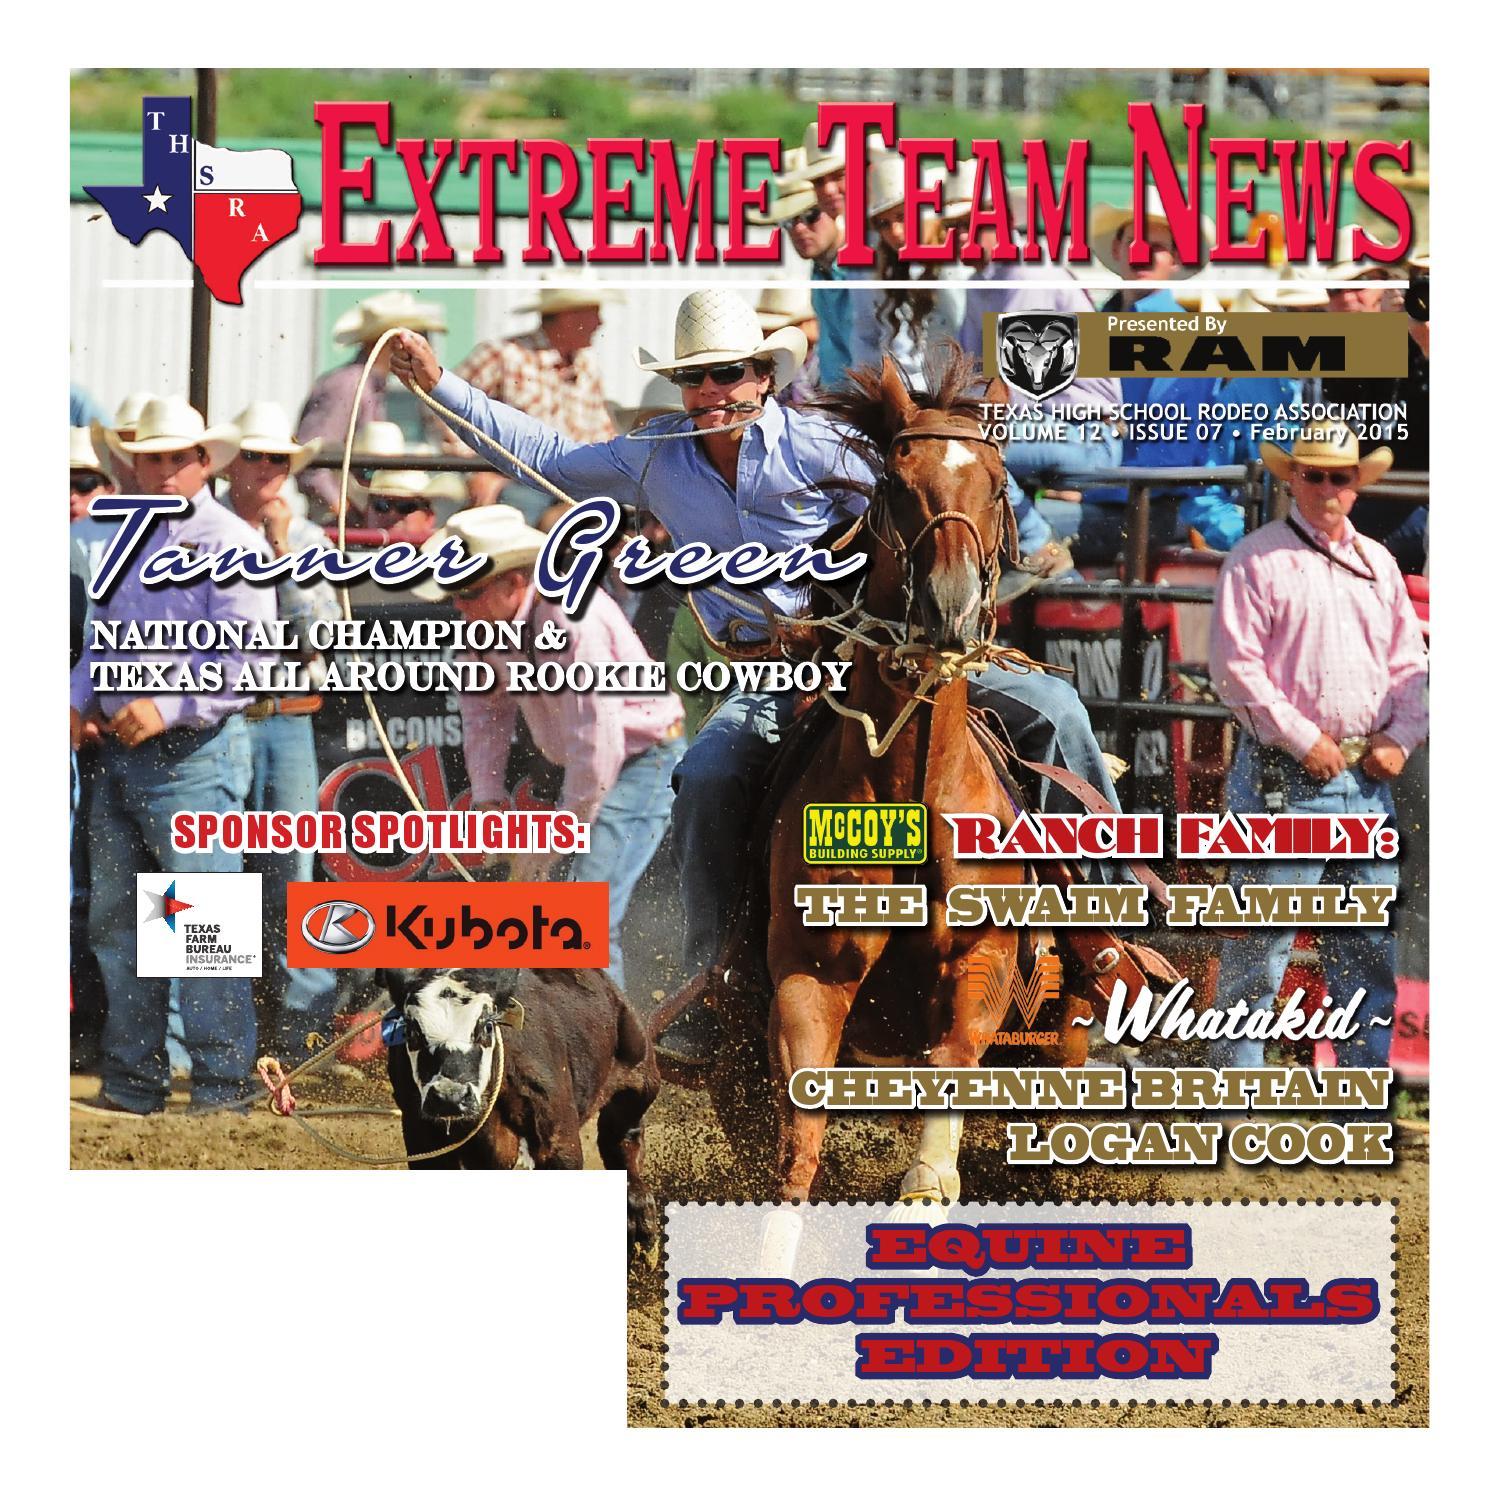 Issuu February 2015 Extreme Team News Texas High School